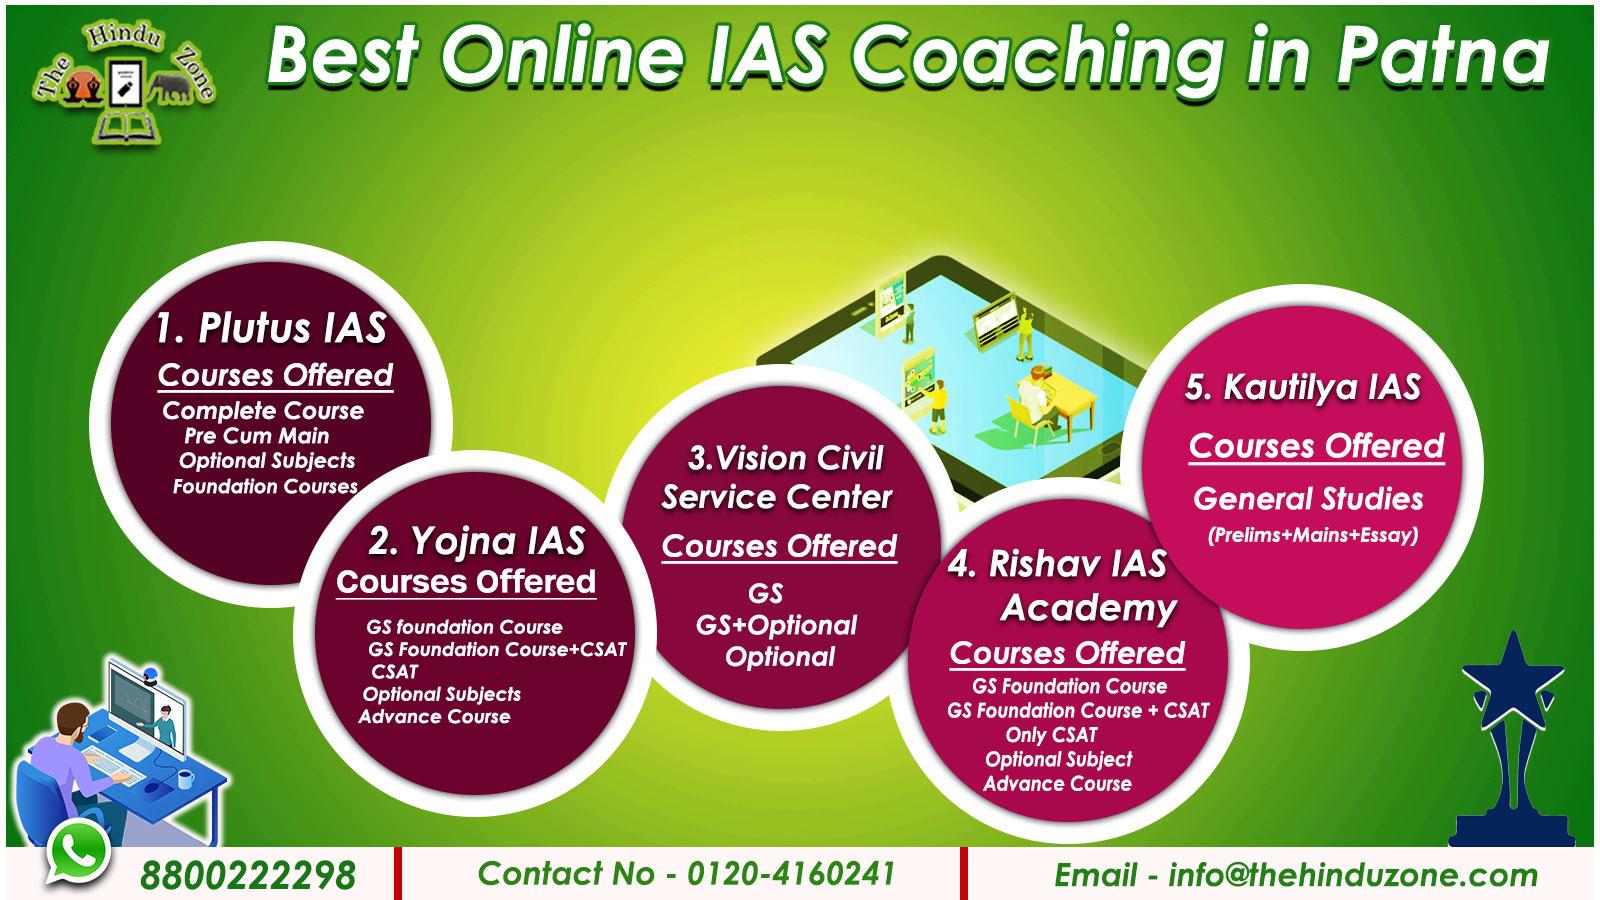 Best Online IAS Coaching In Patna